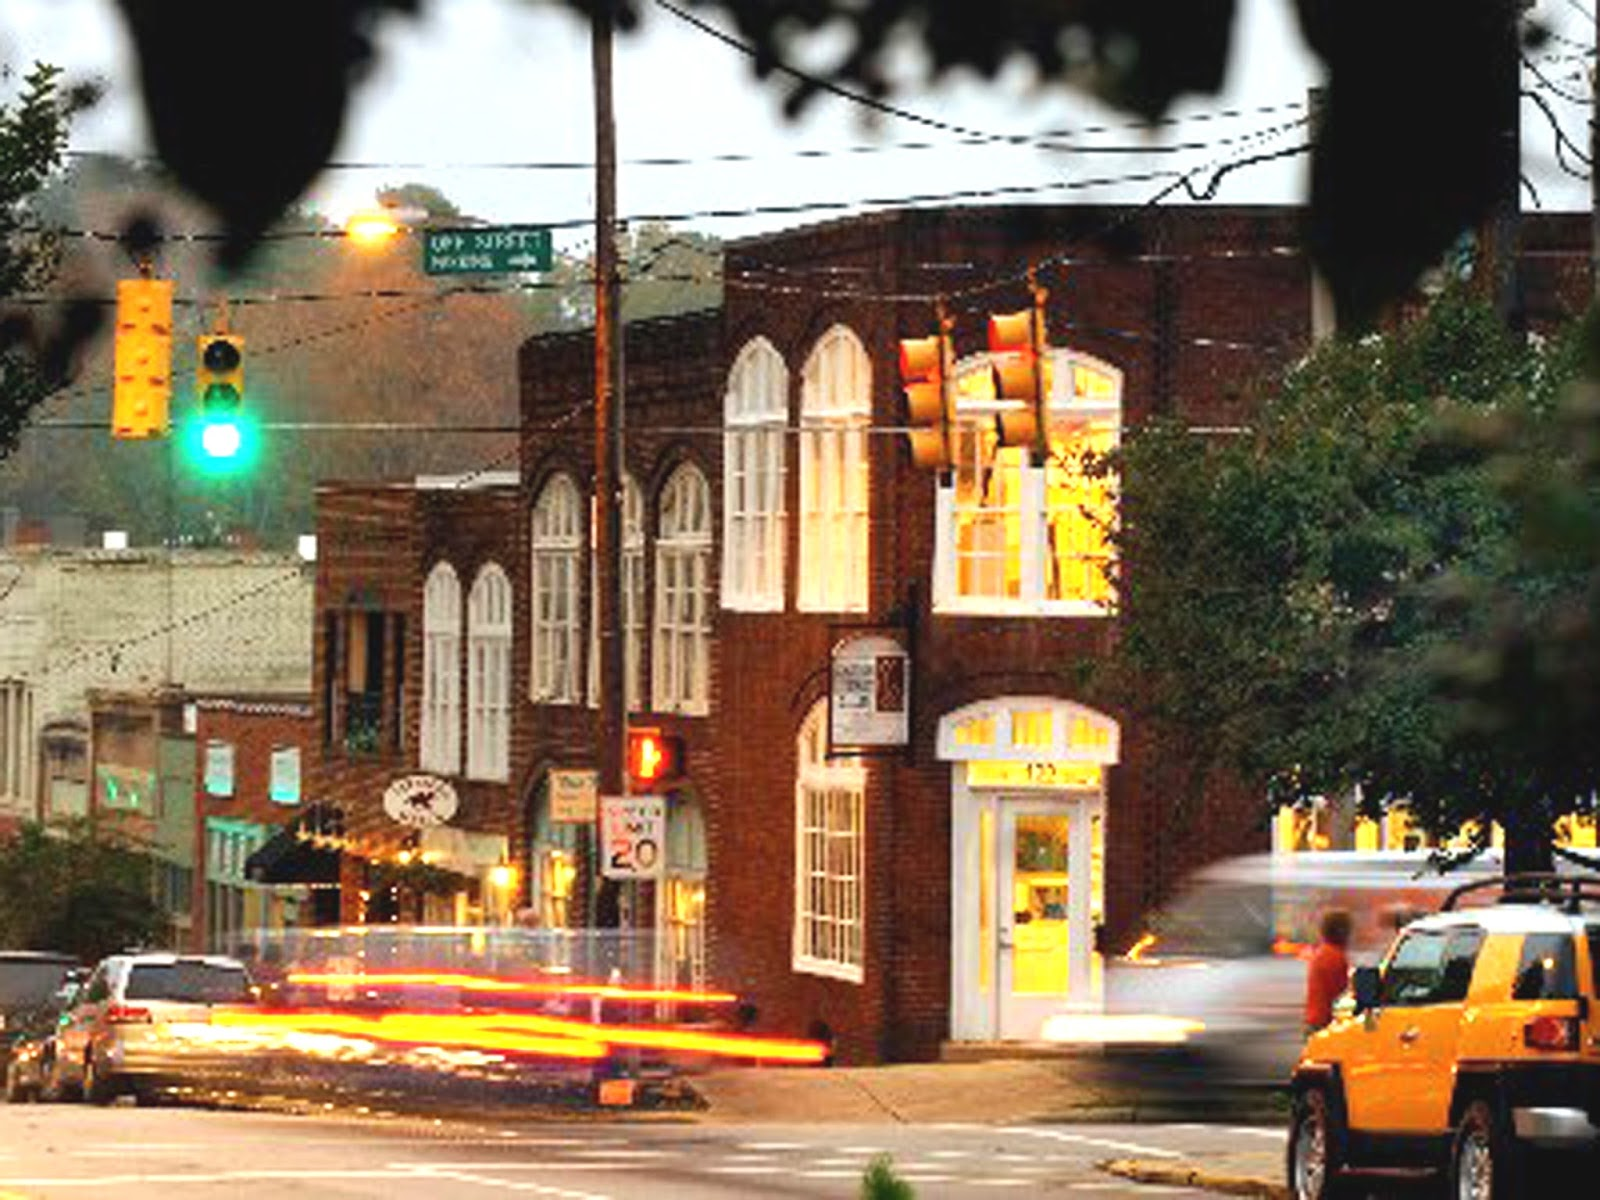 Triangle Tot Spots Downtown Hillsborough